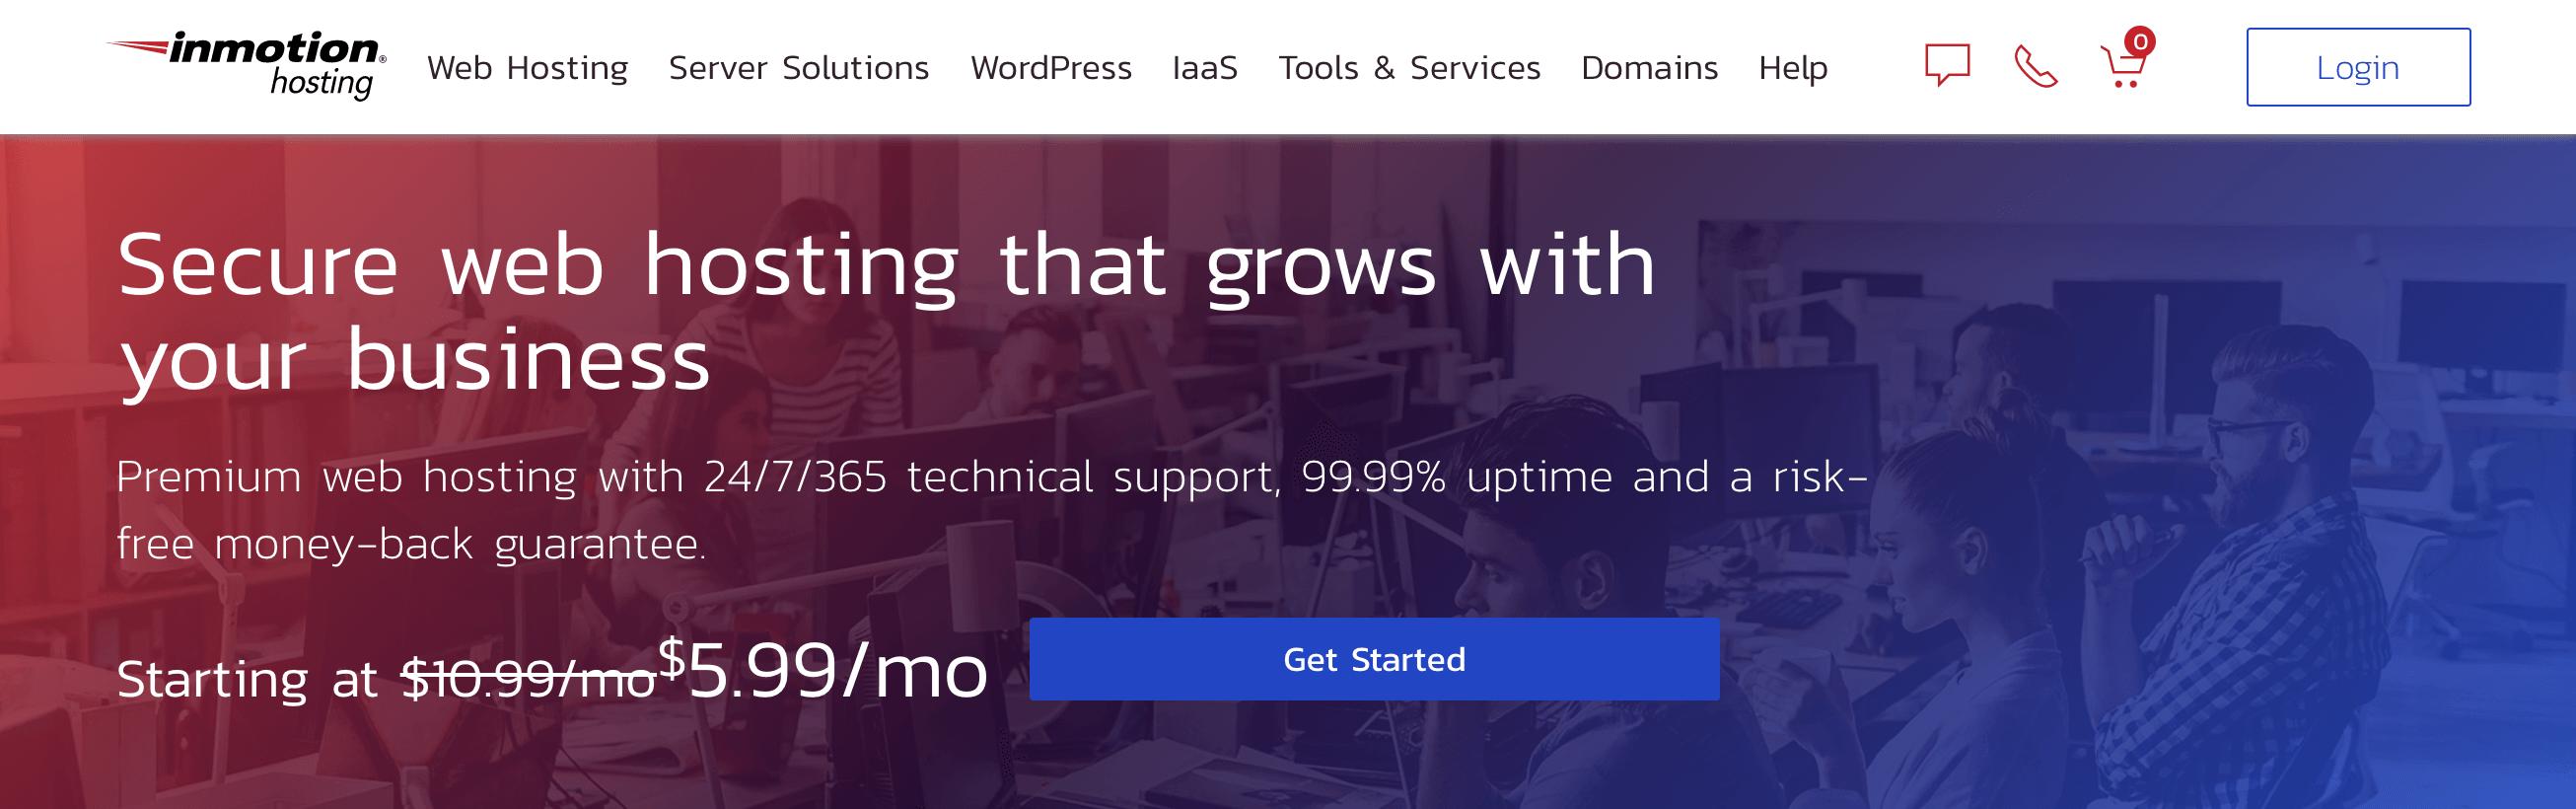 Inmotion托管可以完成业务的预算Wordpress Web主机InMotion托管:可以进行业务的预算WordPress Web主机